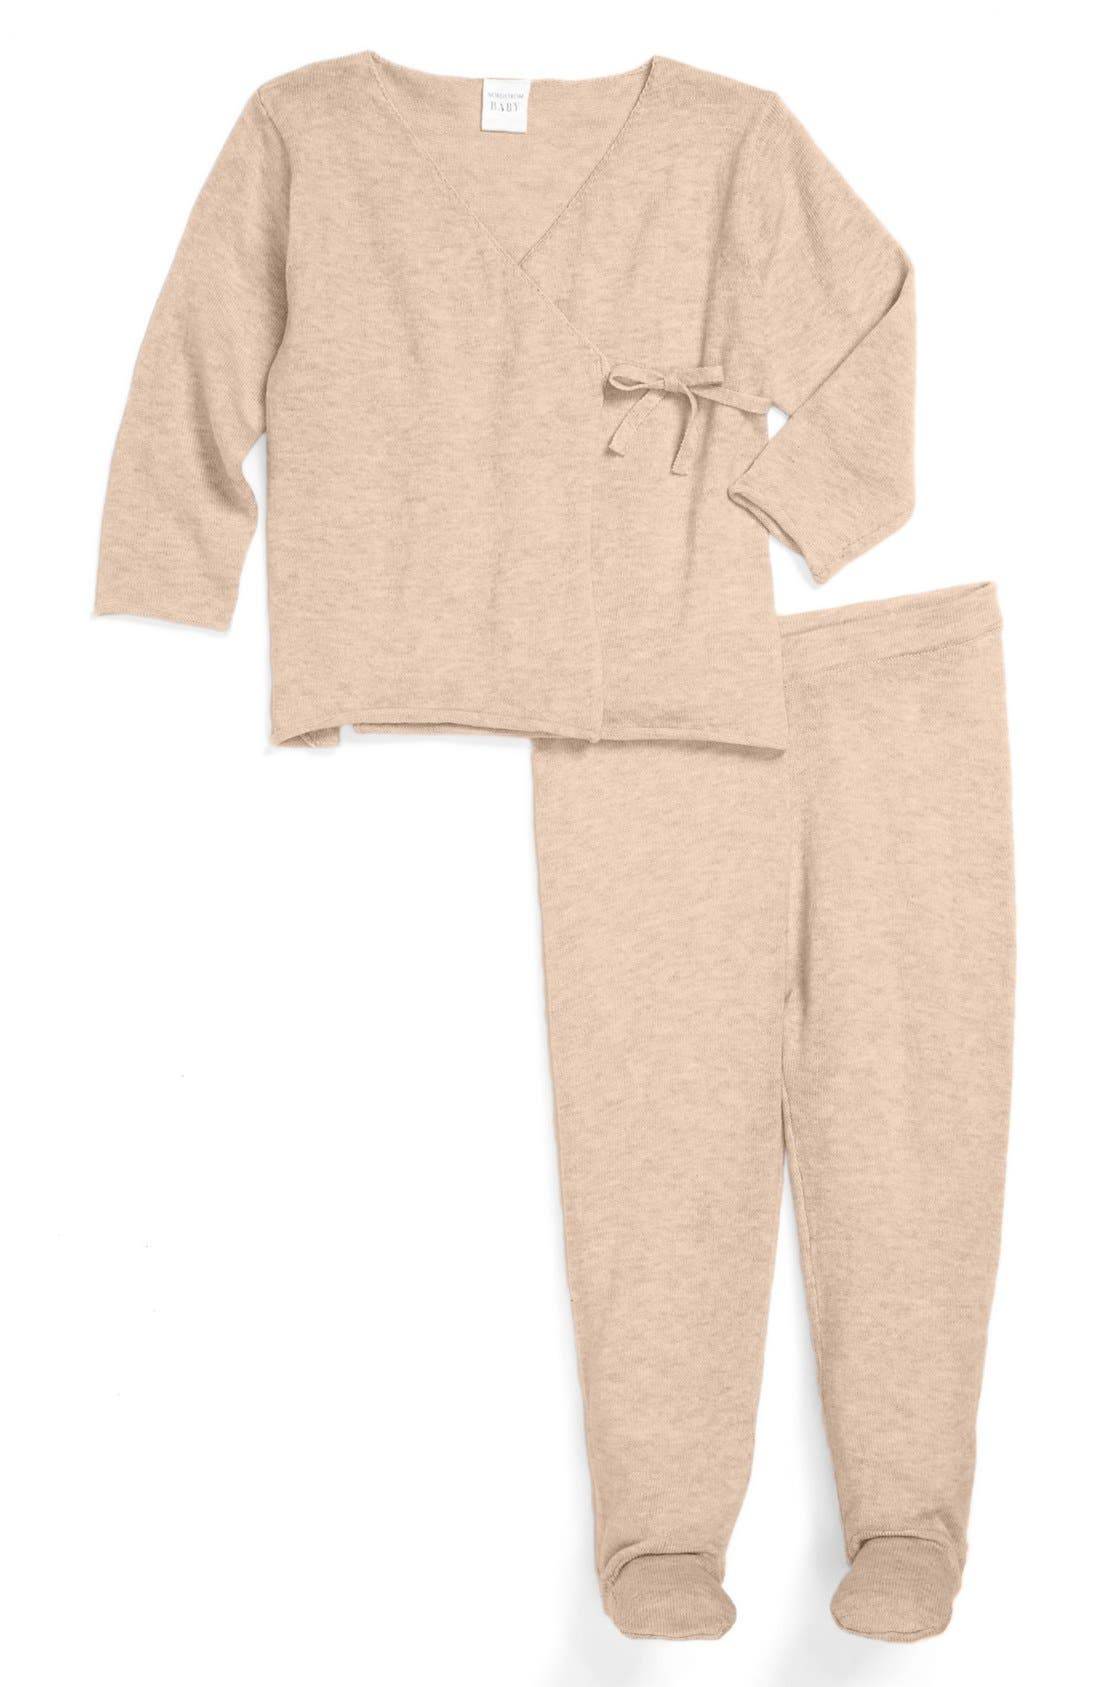 Alternate Image 1 Selected - Nordstrom Baby Top & Pants (Baby)